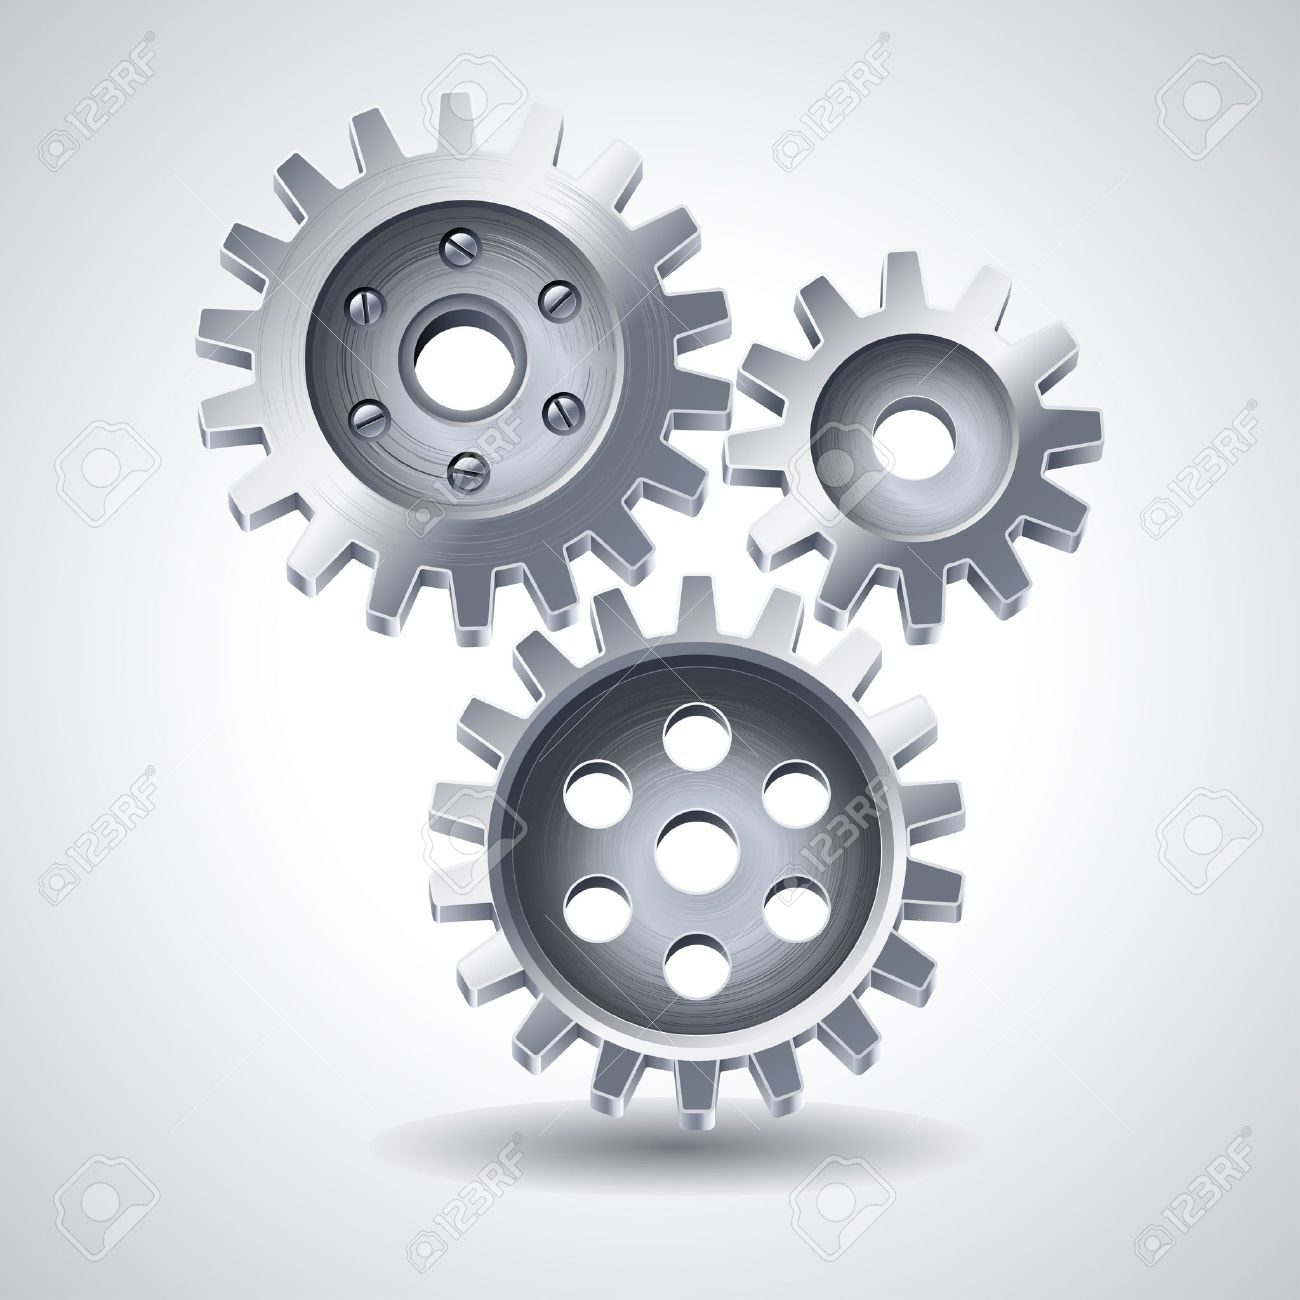 gears icon Stock Vector - 14556268